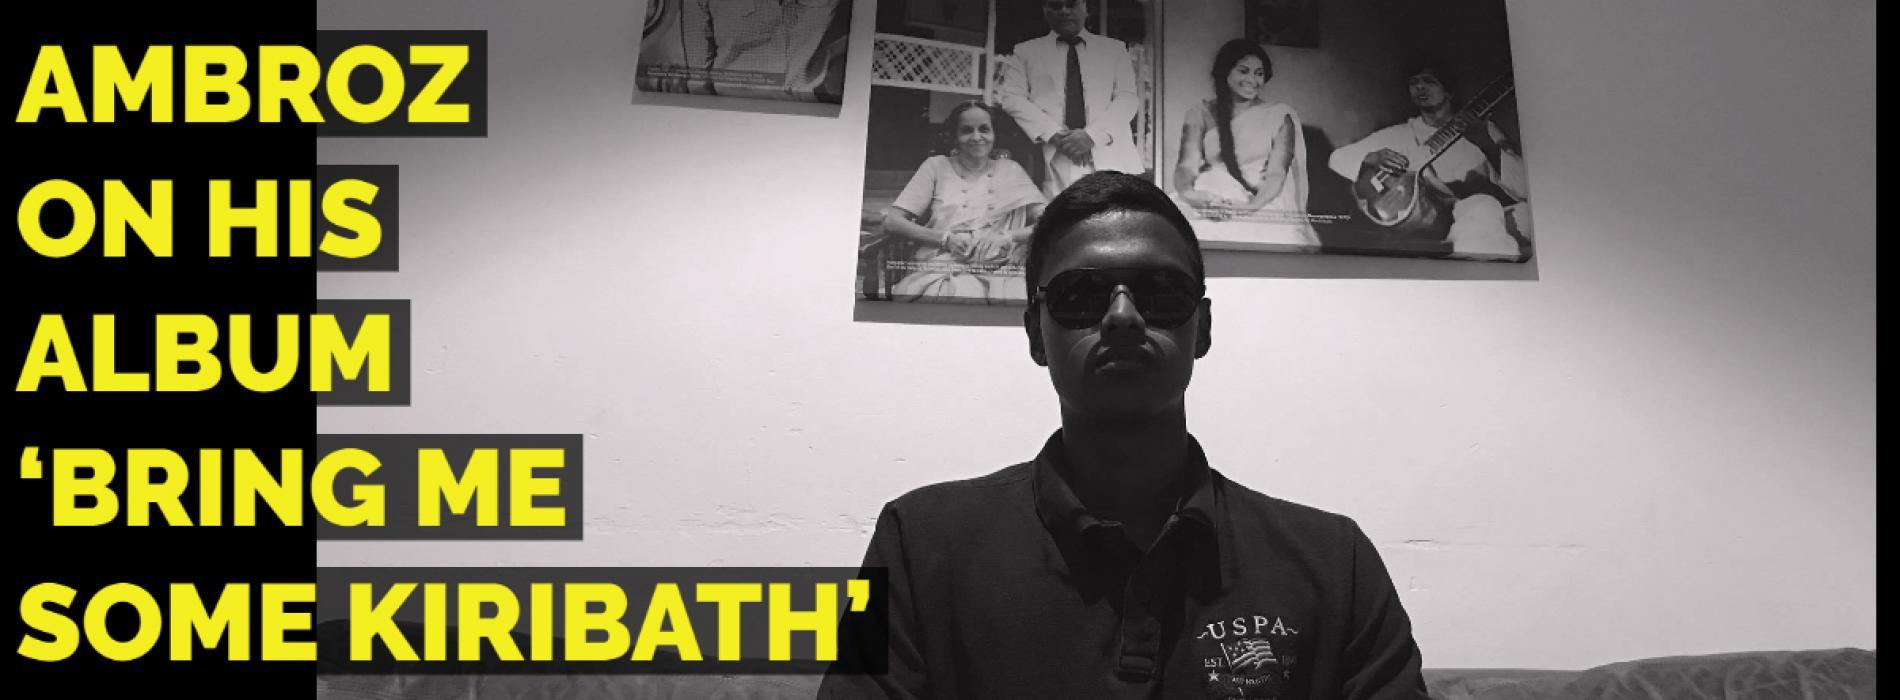 Exclusive : Ambroz On His Album 'Bring Me Some Kiribath'